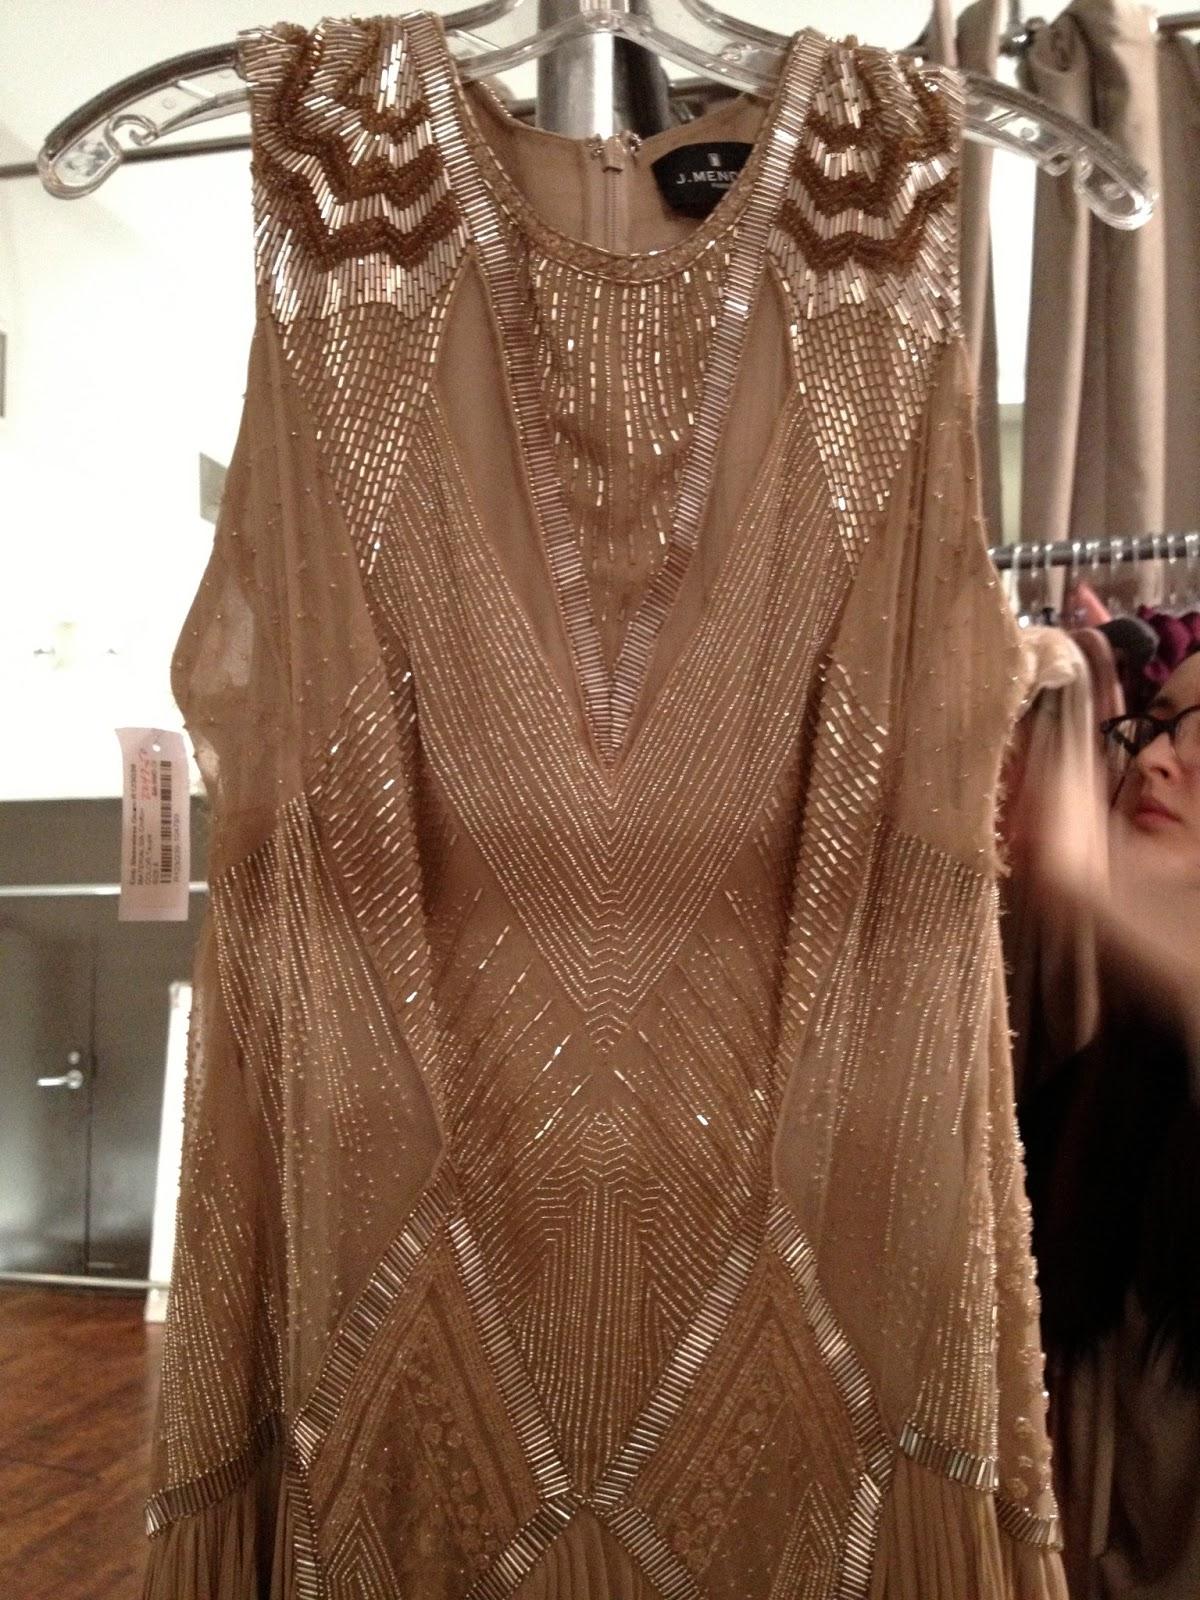 New York à la Keiko: nykeiko shops: The gowns at J.Mendel sample ...